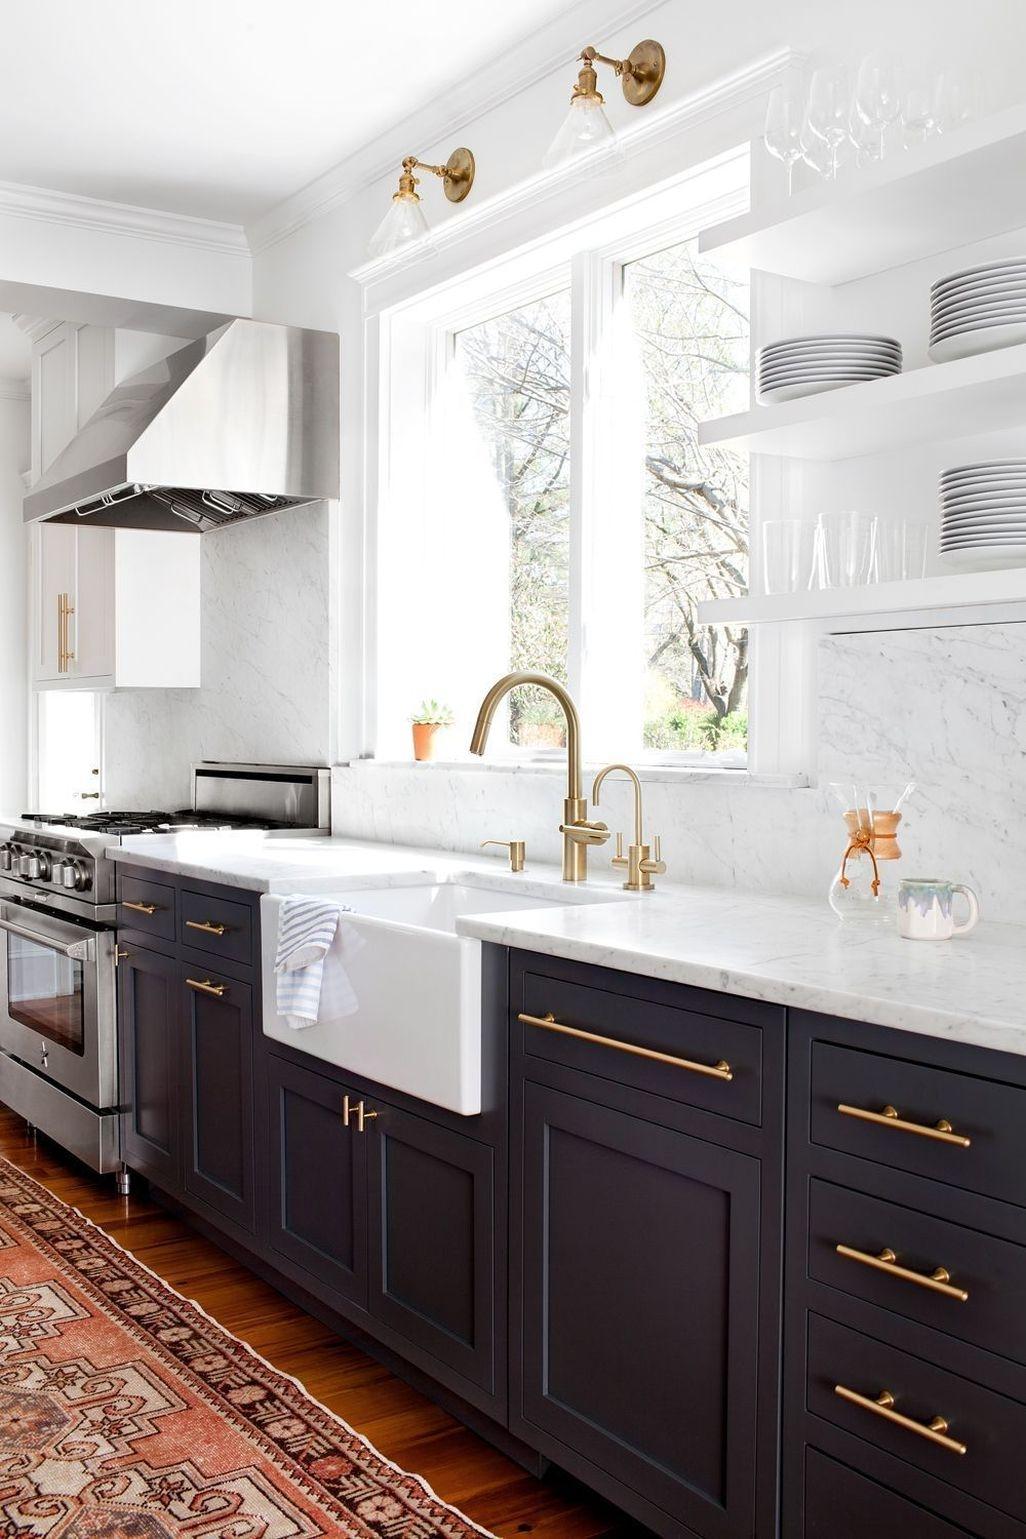 Modern And Minimalist Kitchen Decoration Ideas 31